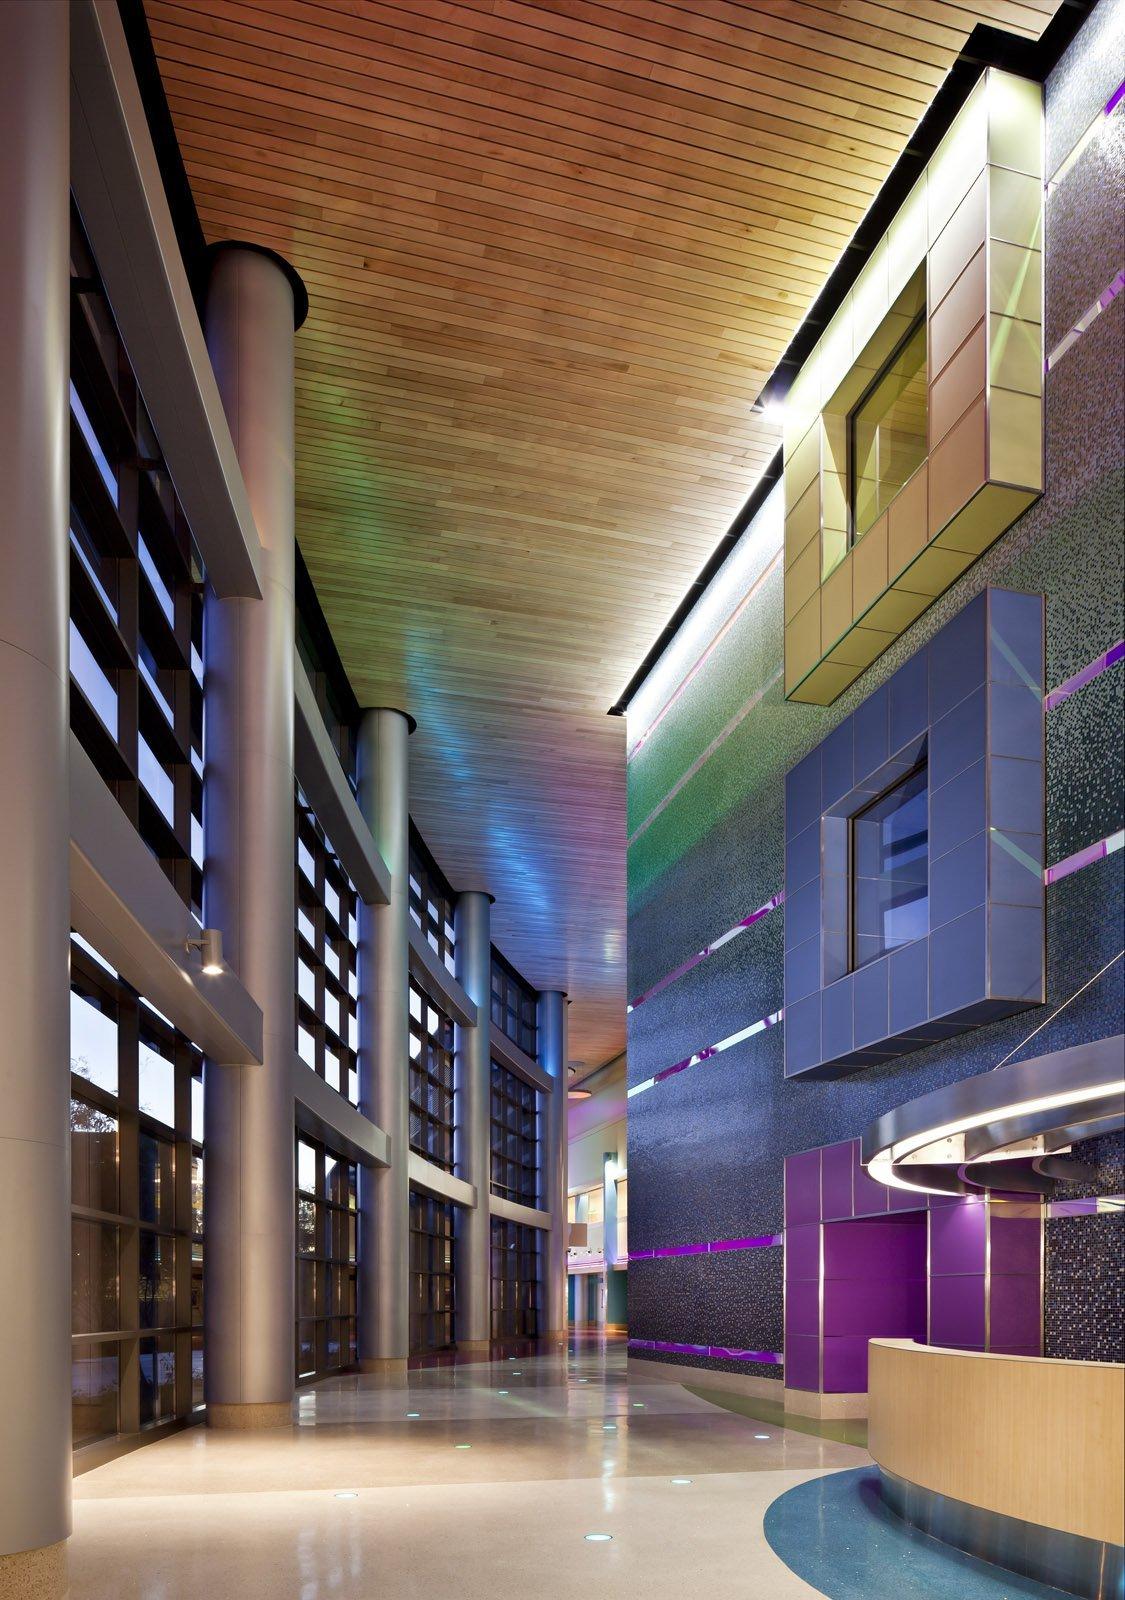 Gallery of Phoenix Children's Hospital / HKS Architects - 26